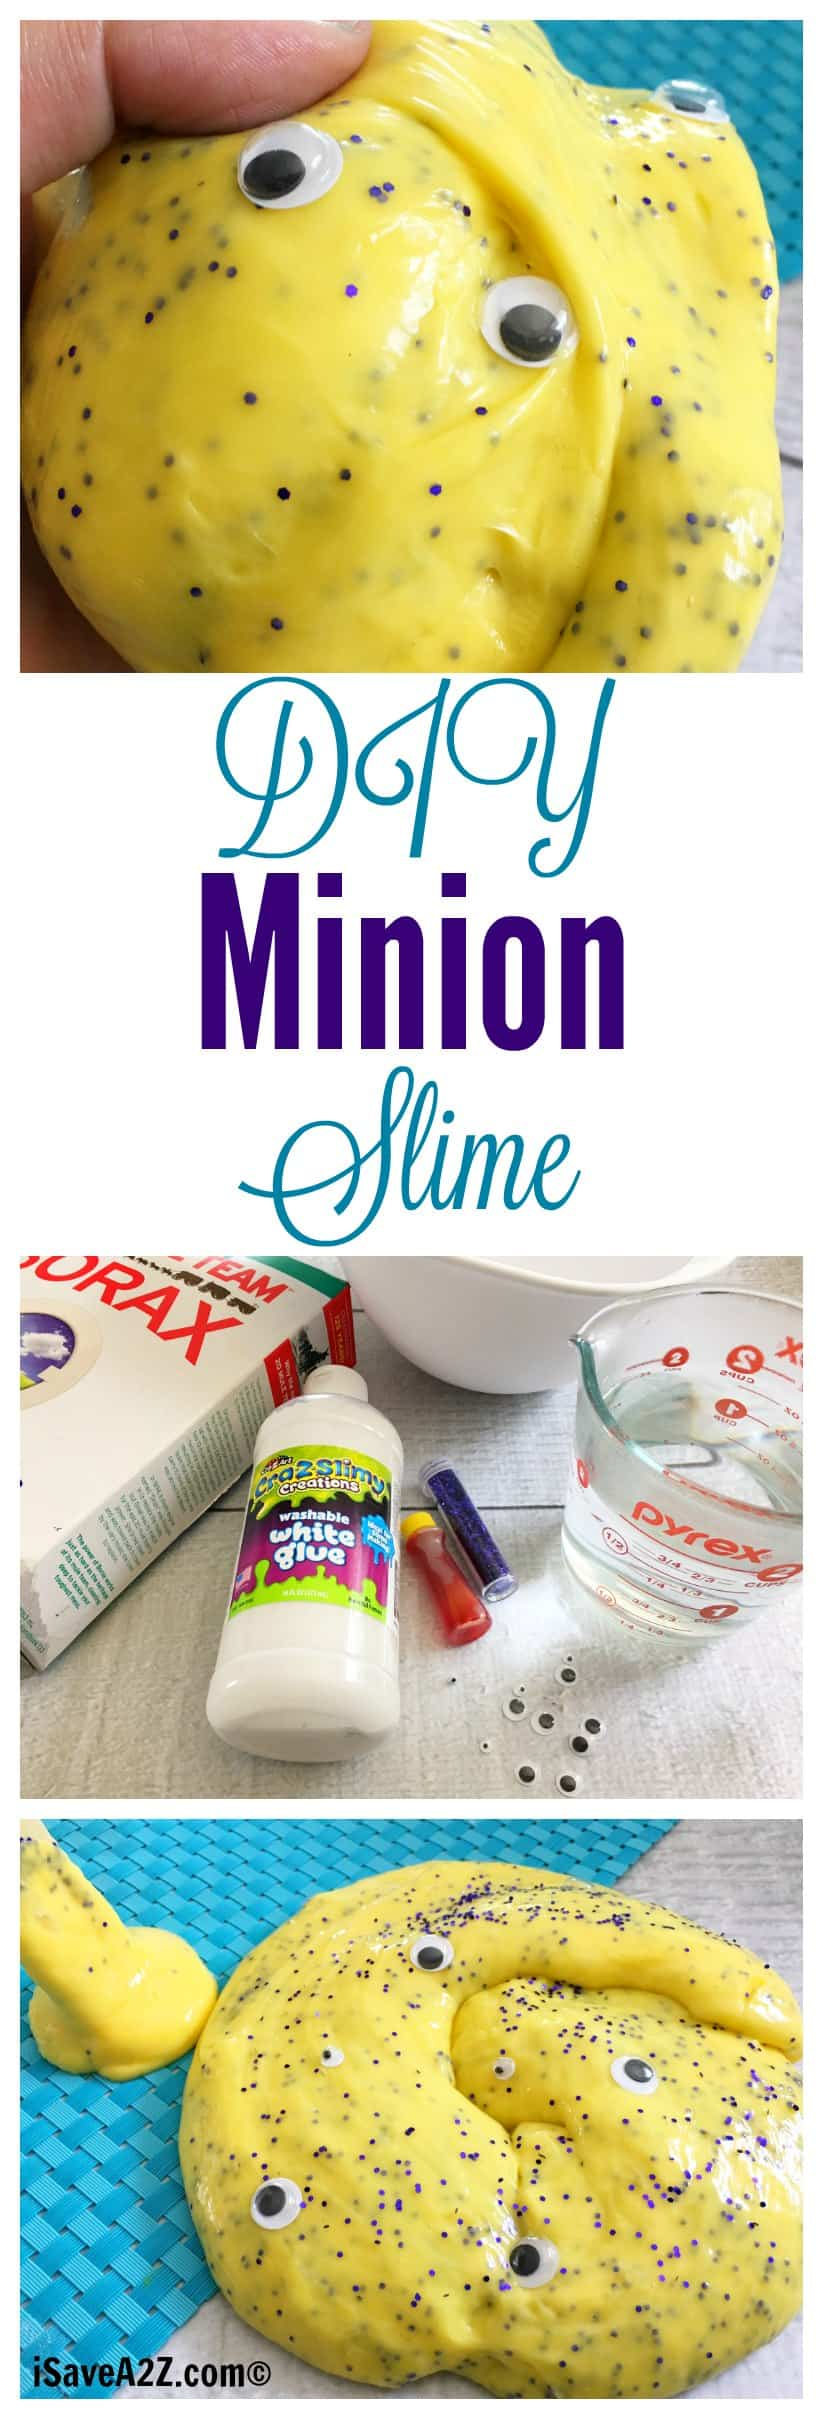 DIY Minion Slime